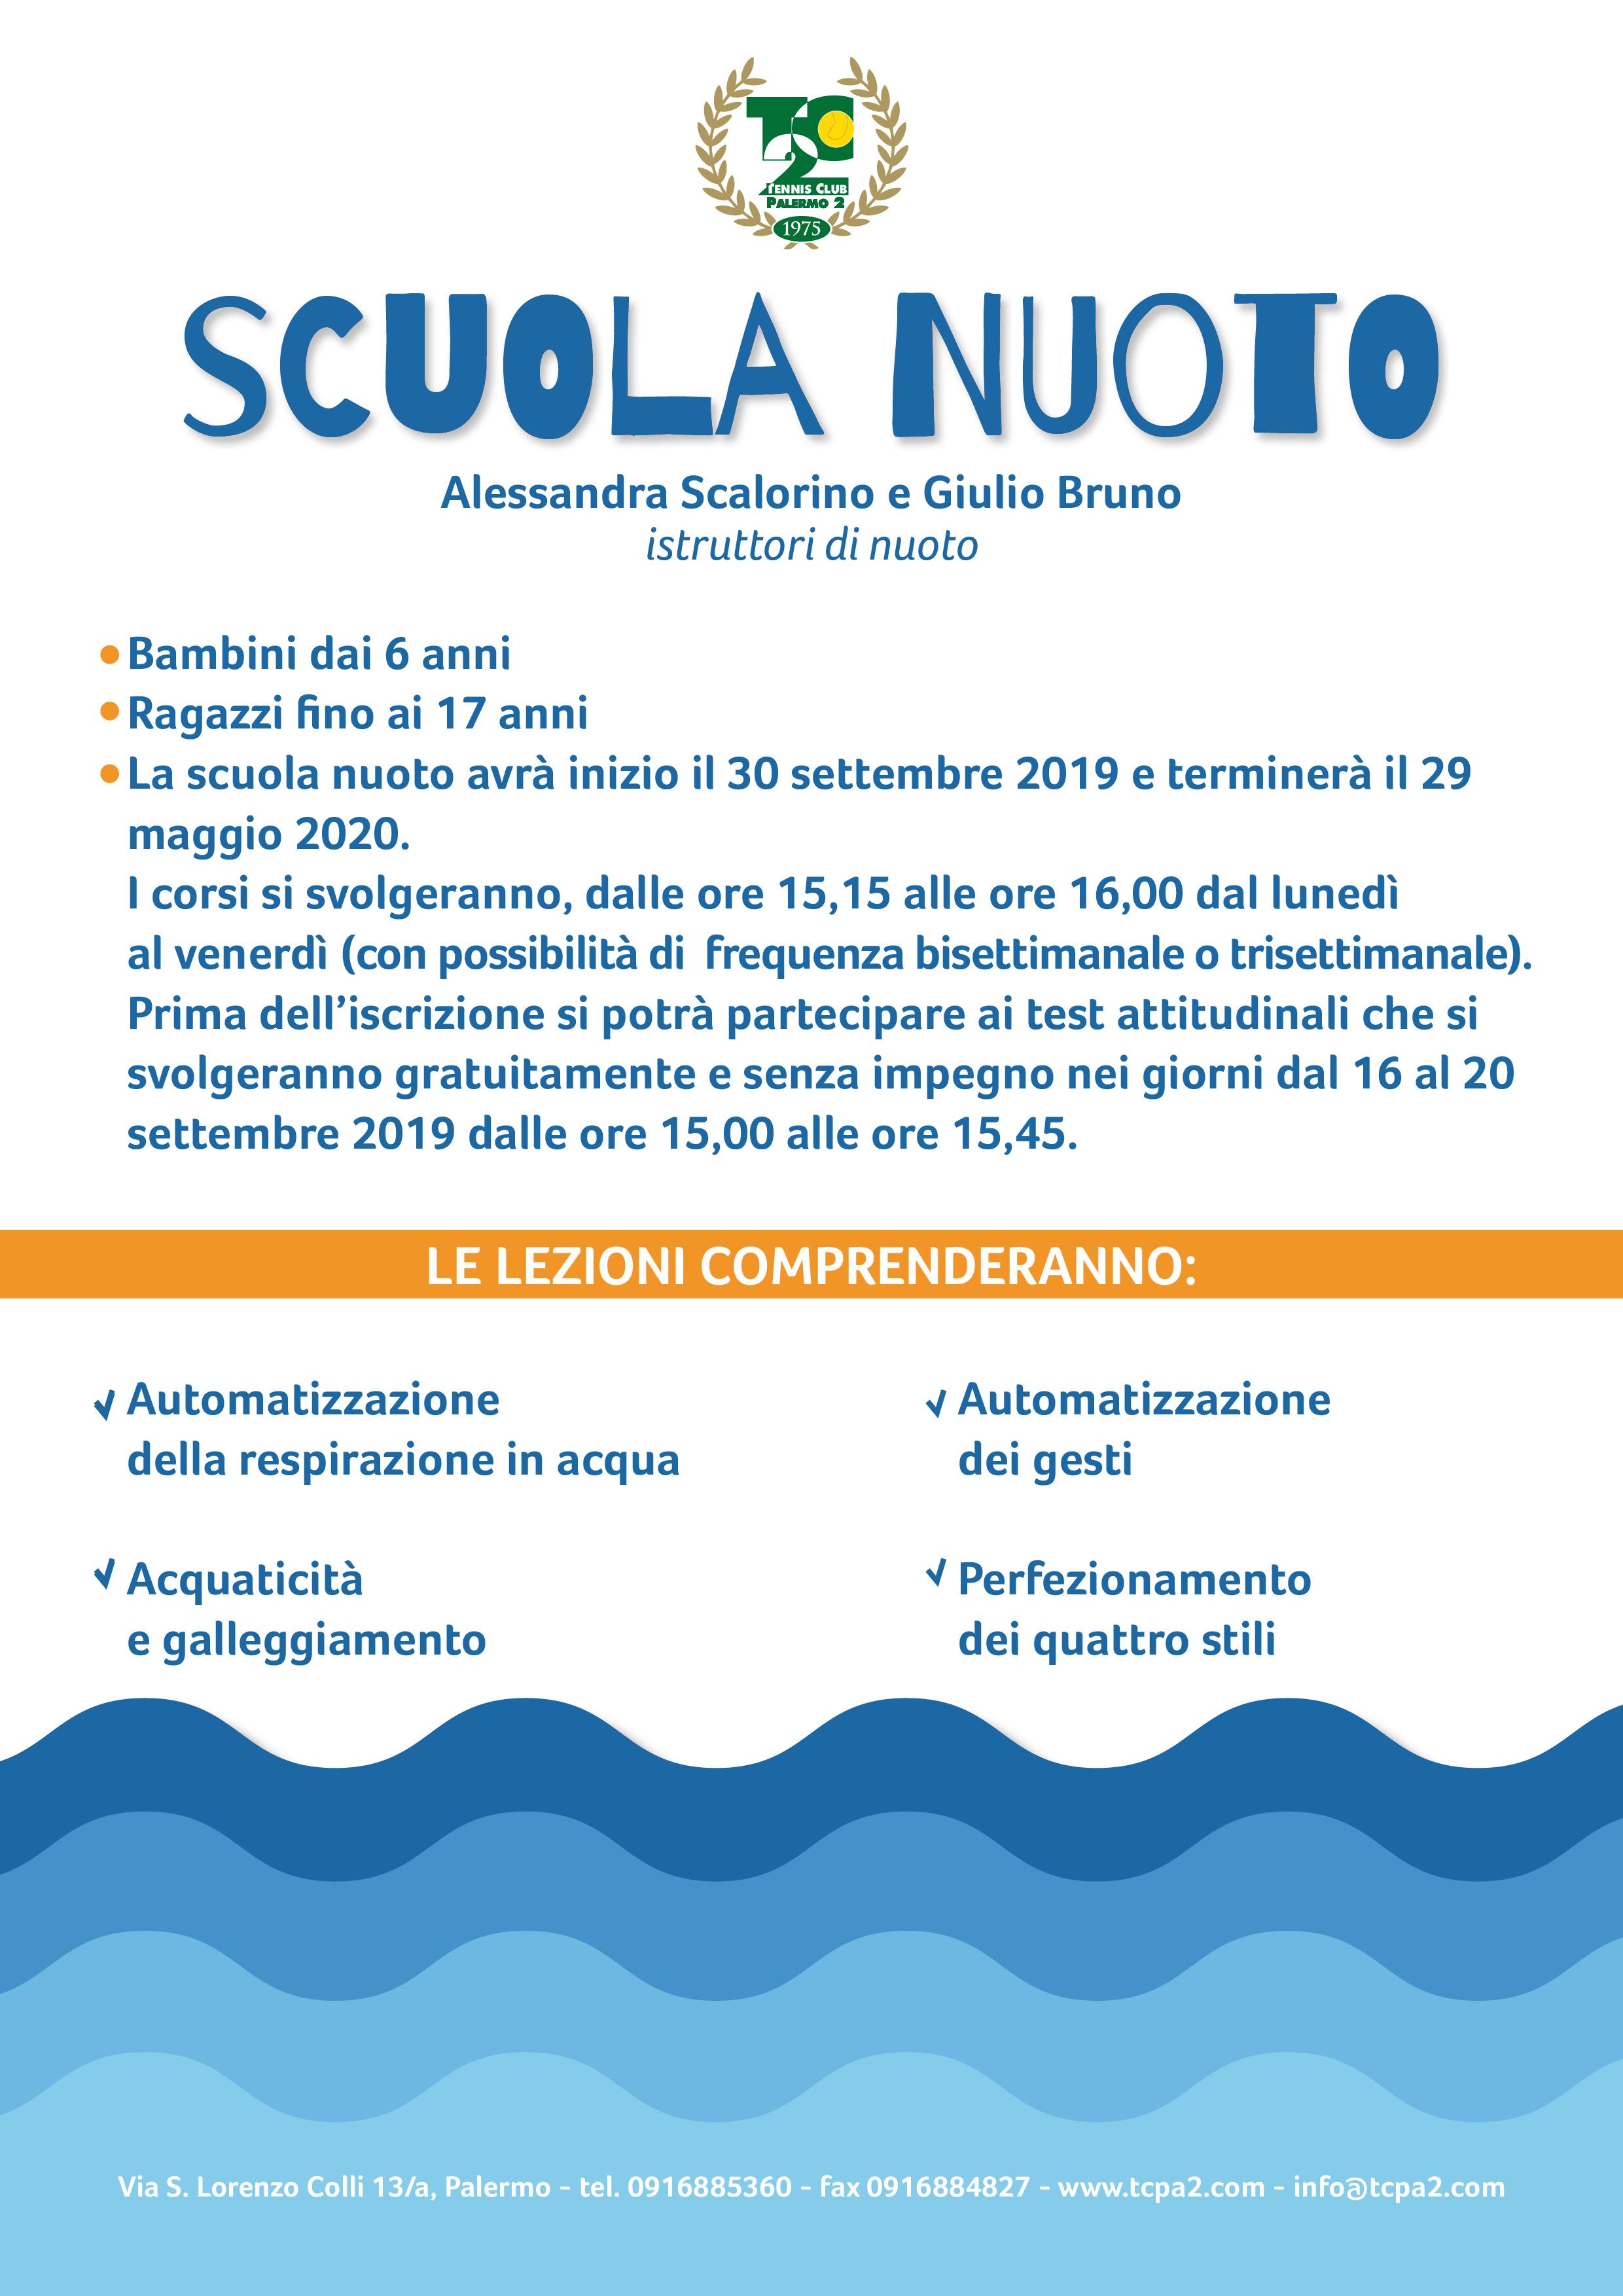 locandina-scuola-nuoto